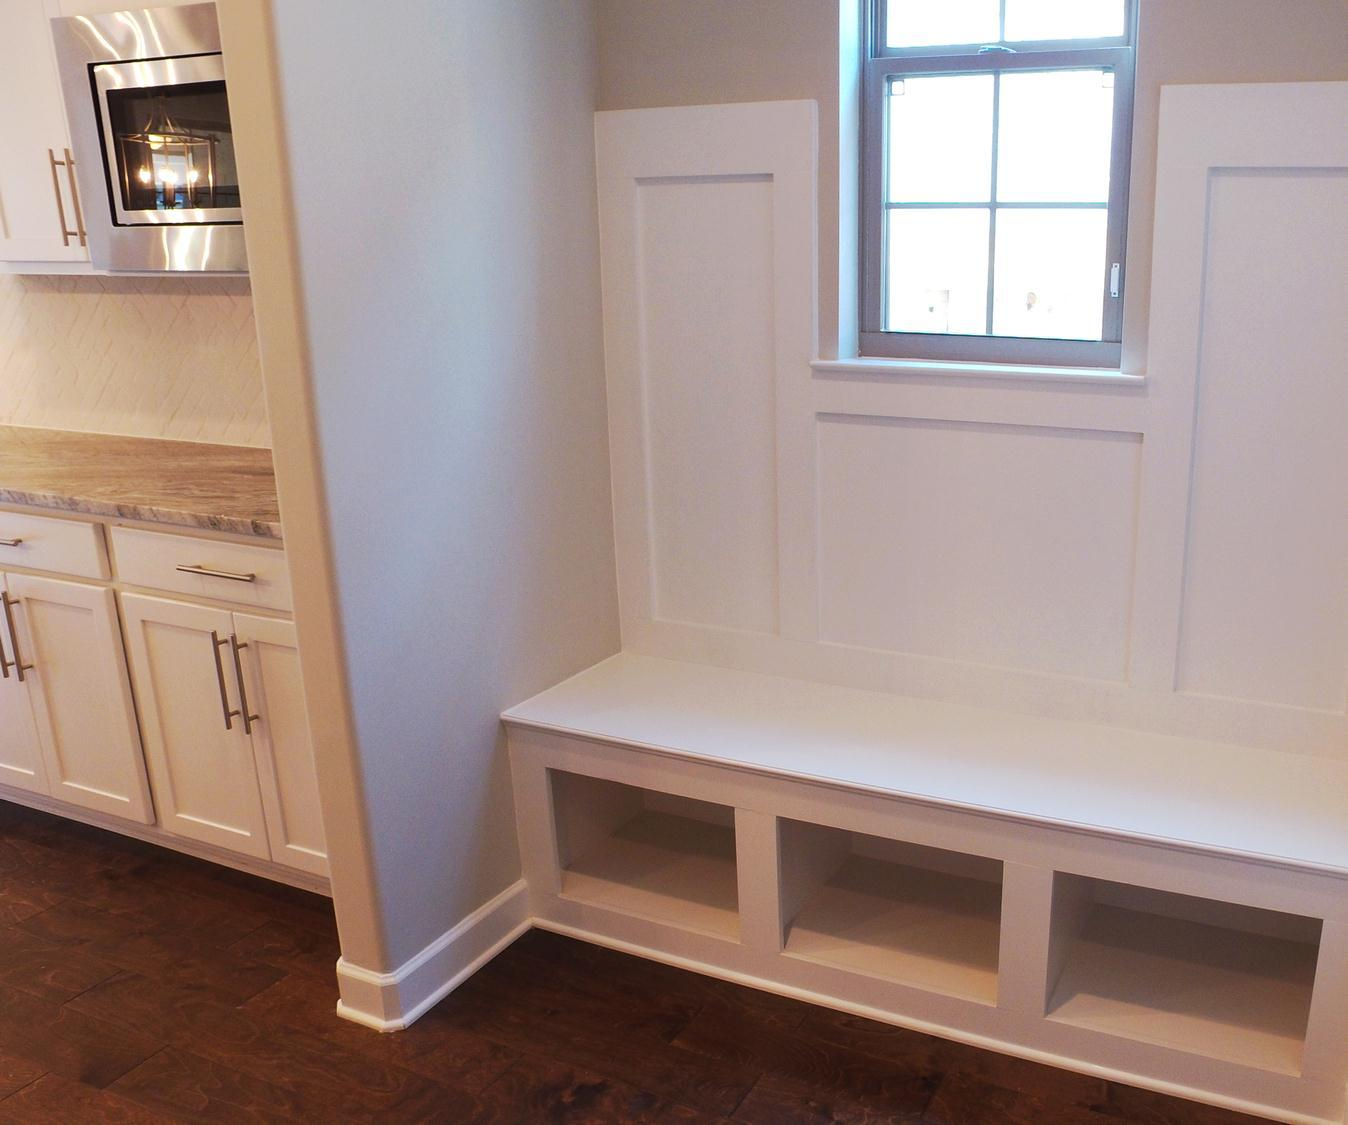 Living Area featured in the Harper By Regency Homebuilders in Memphis, TN